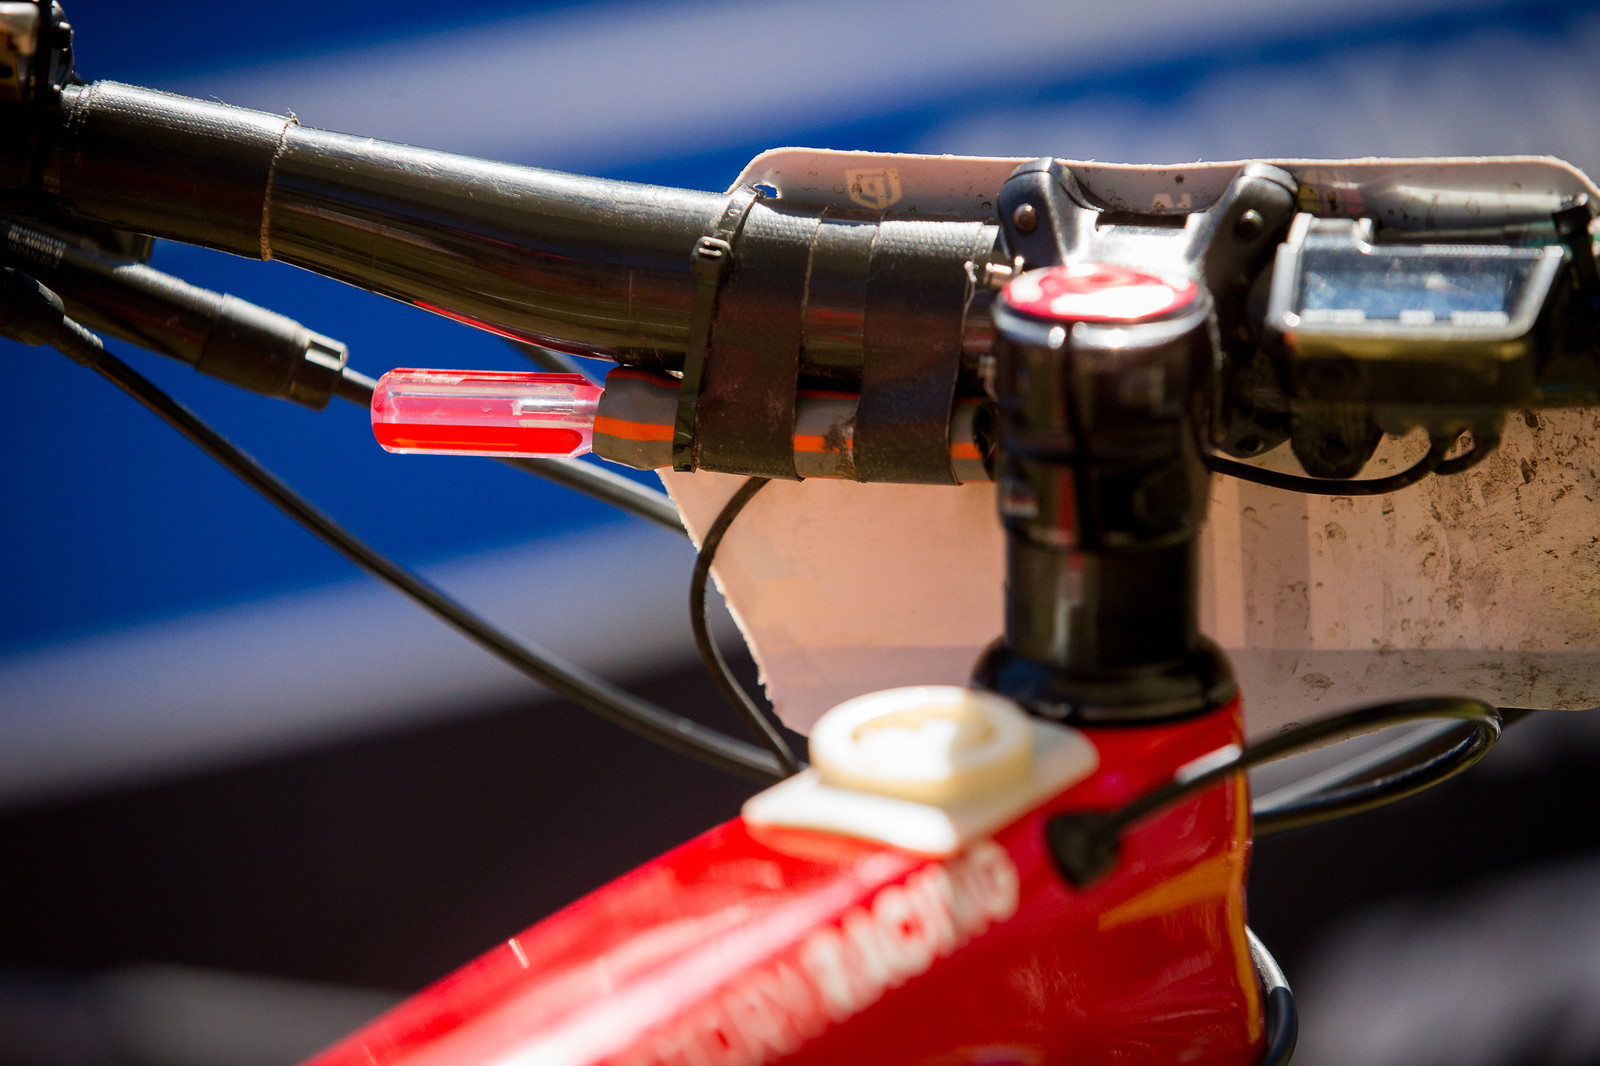 Rene Wildhaber's Tire Plugs - PIT BITS - Enduro World Series, La Thuile, Italy - Mountain Biking Pictures - Vital MTB